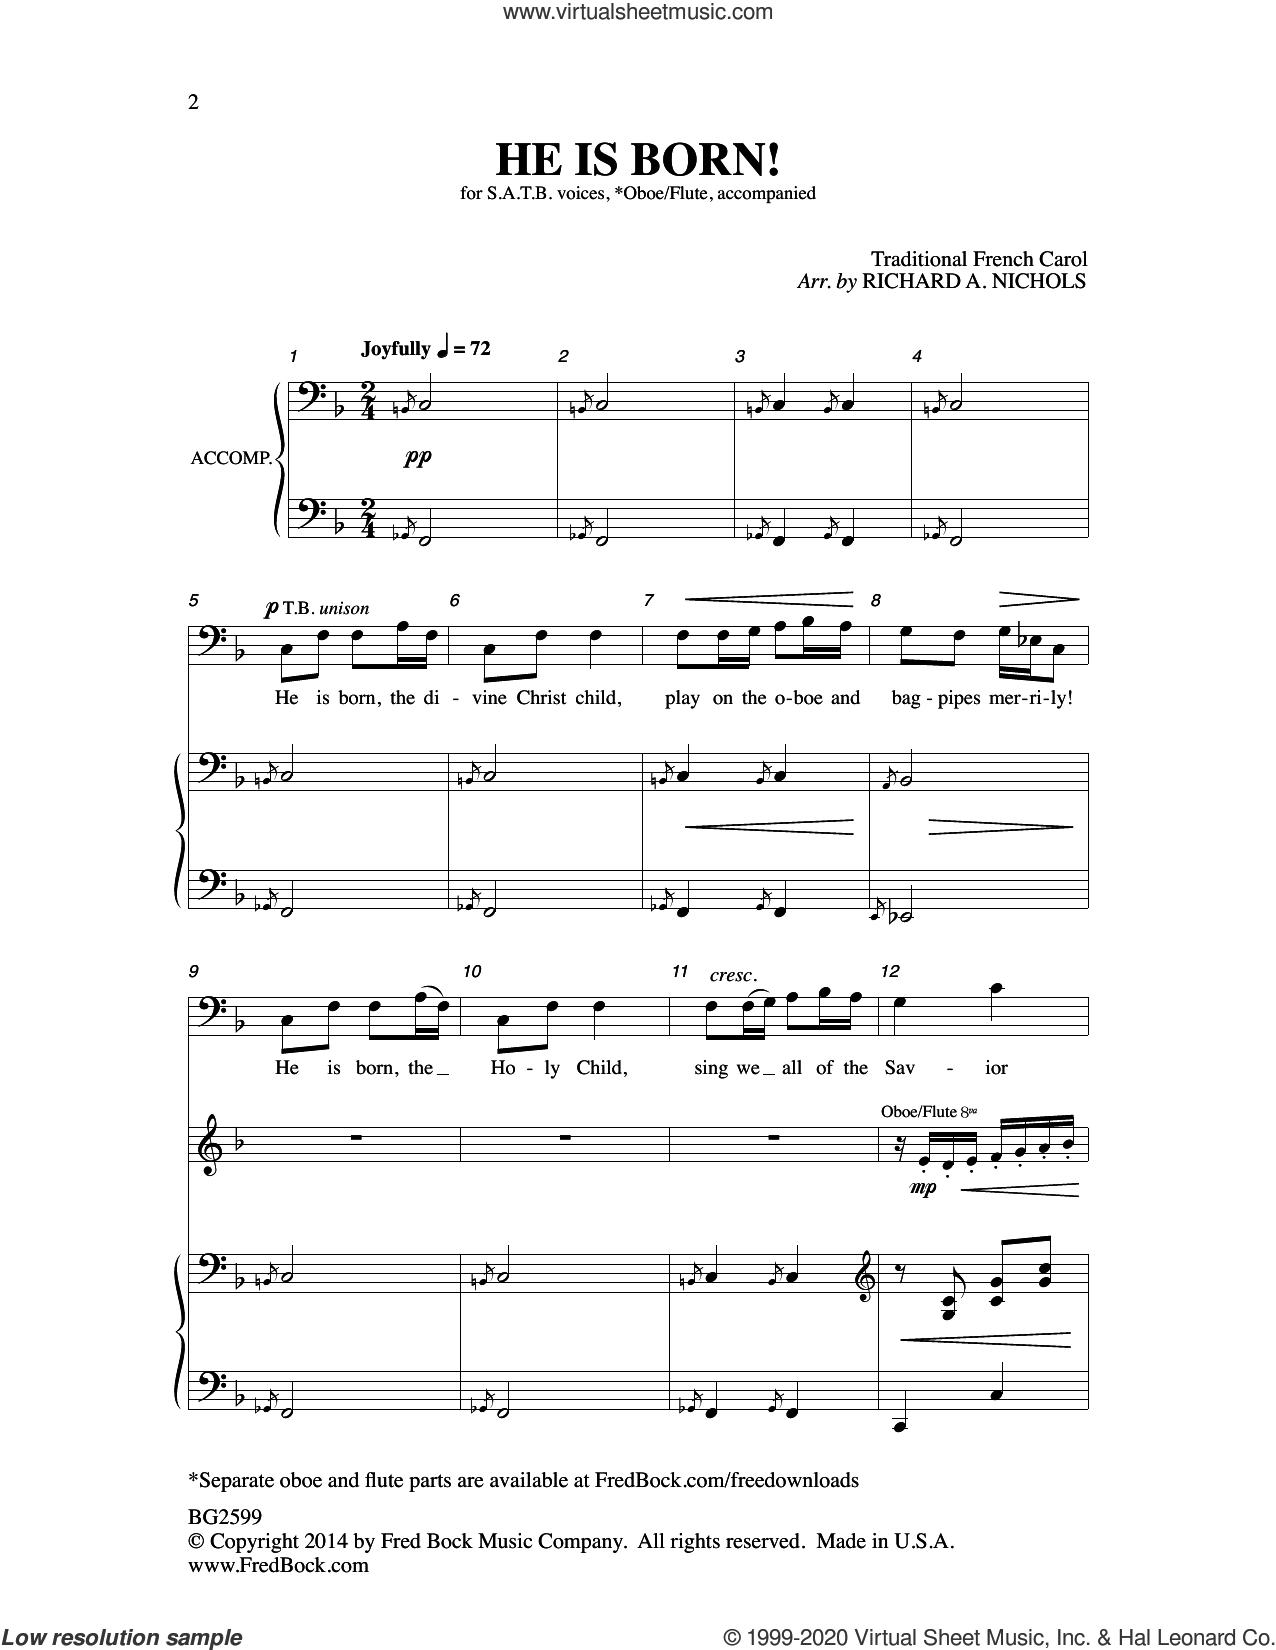 He Is Born sheet music for choir by Richard A. Nichols, intermediate skill level